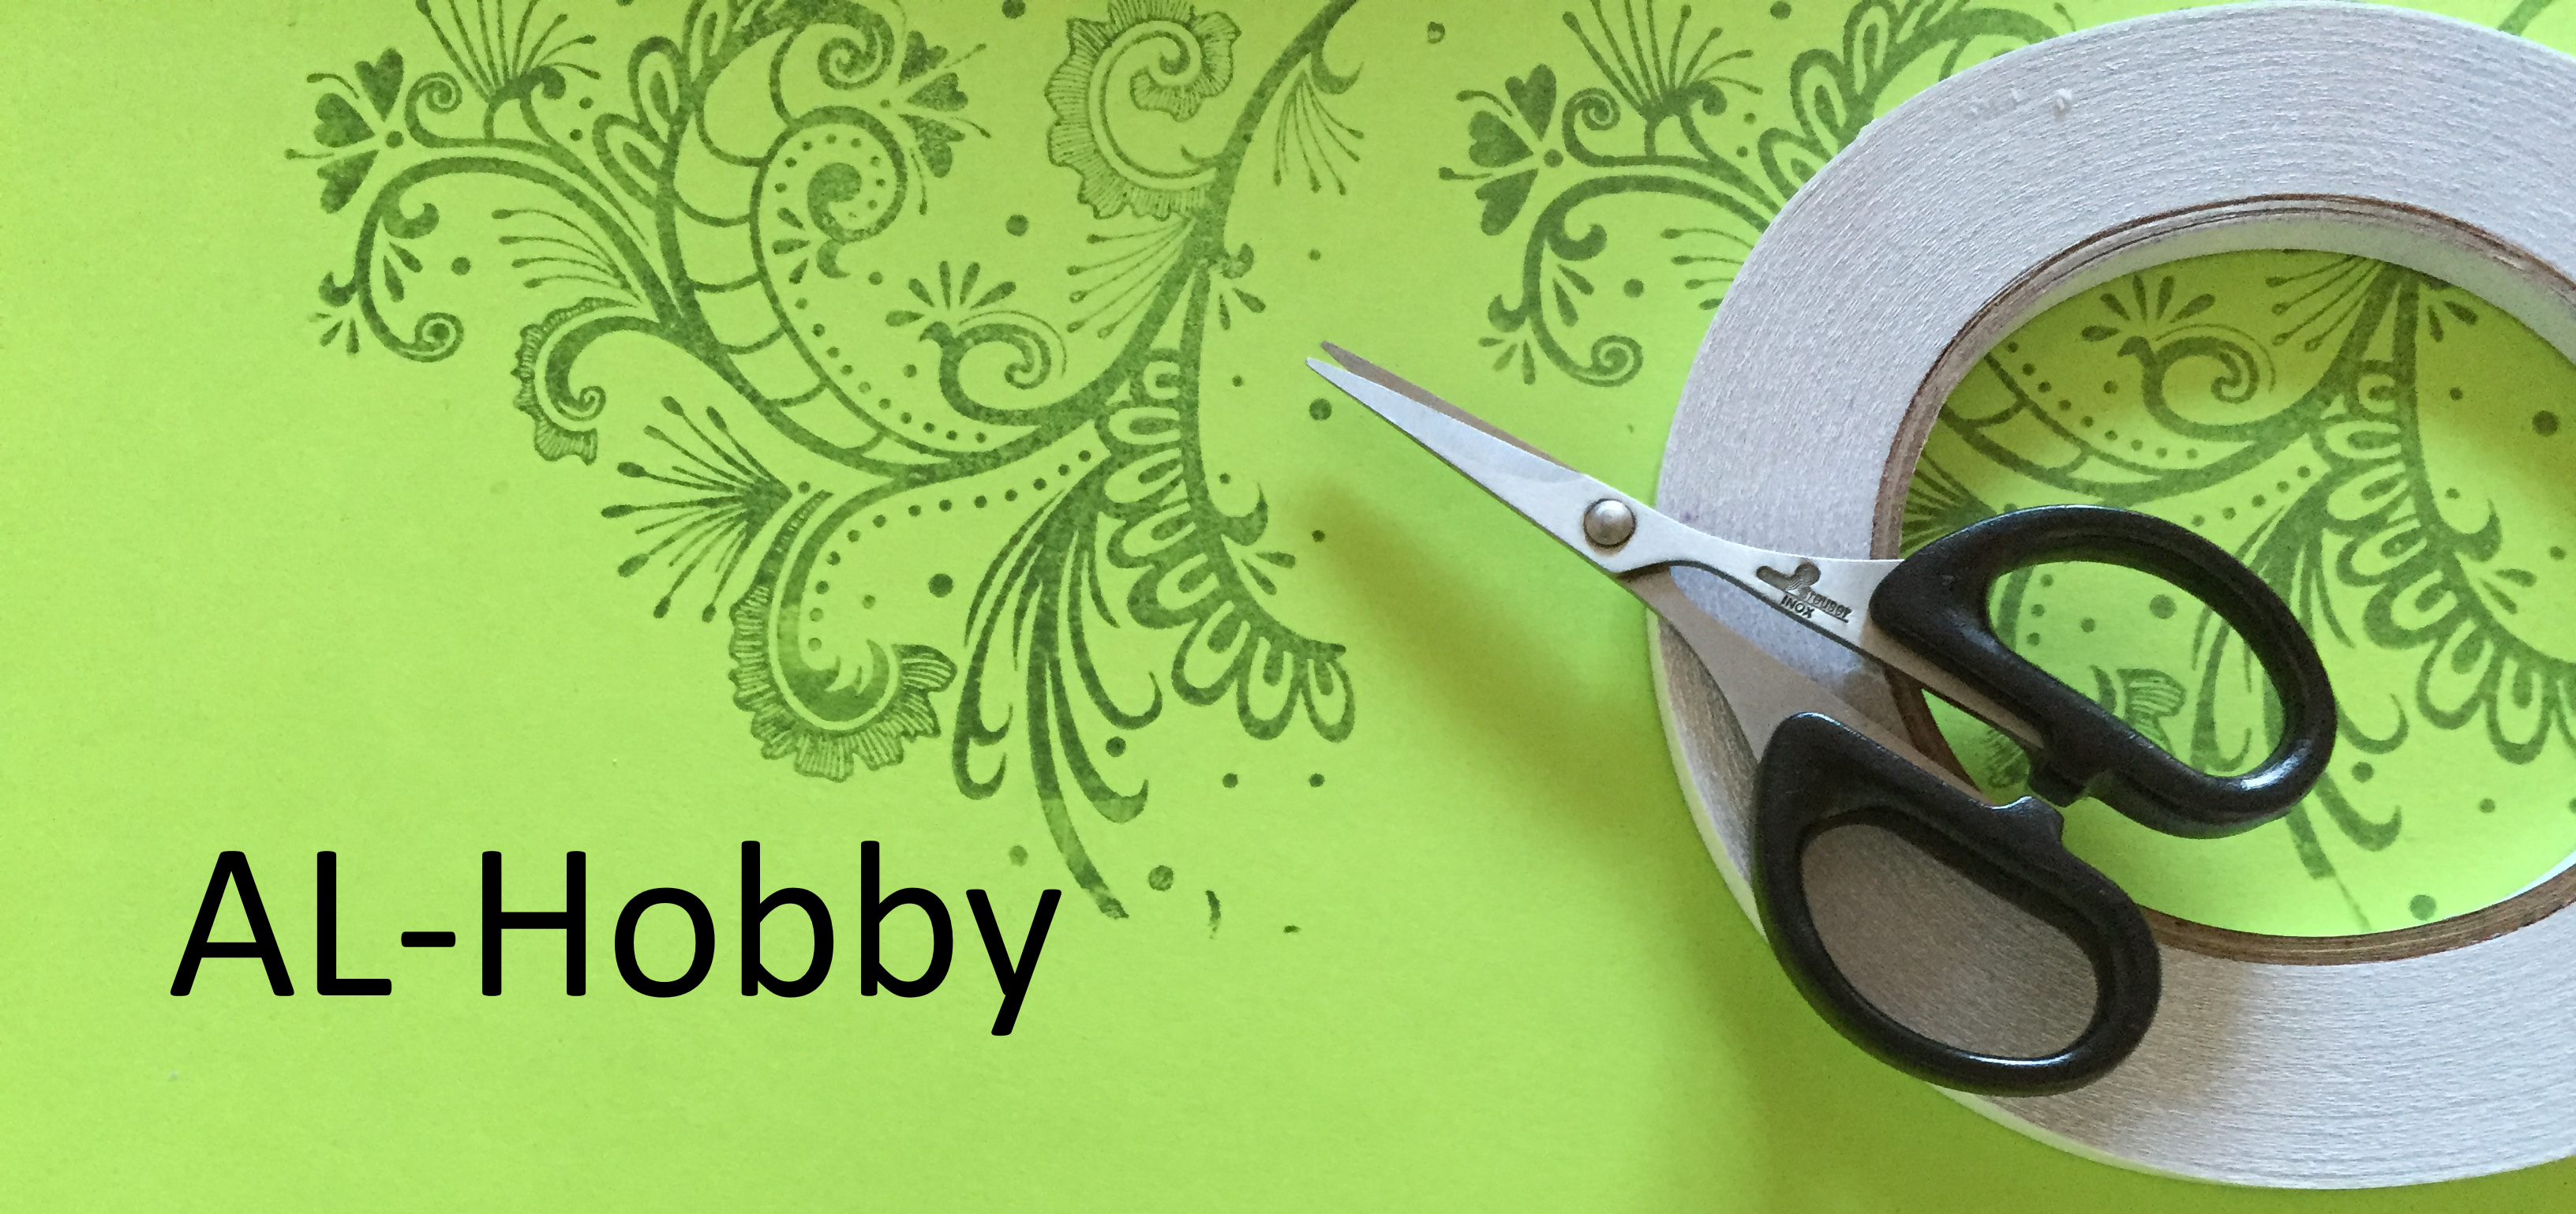 AL-Hobby